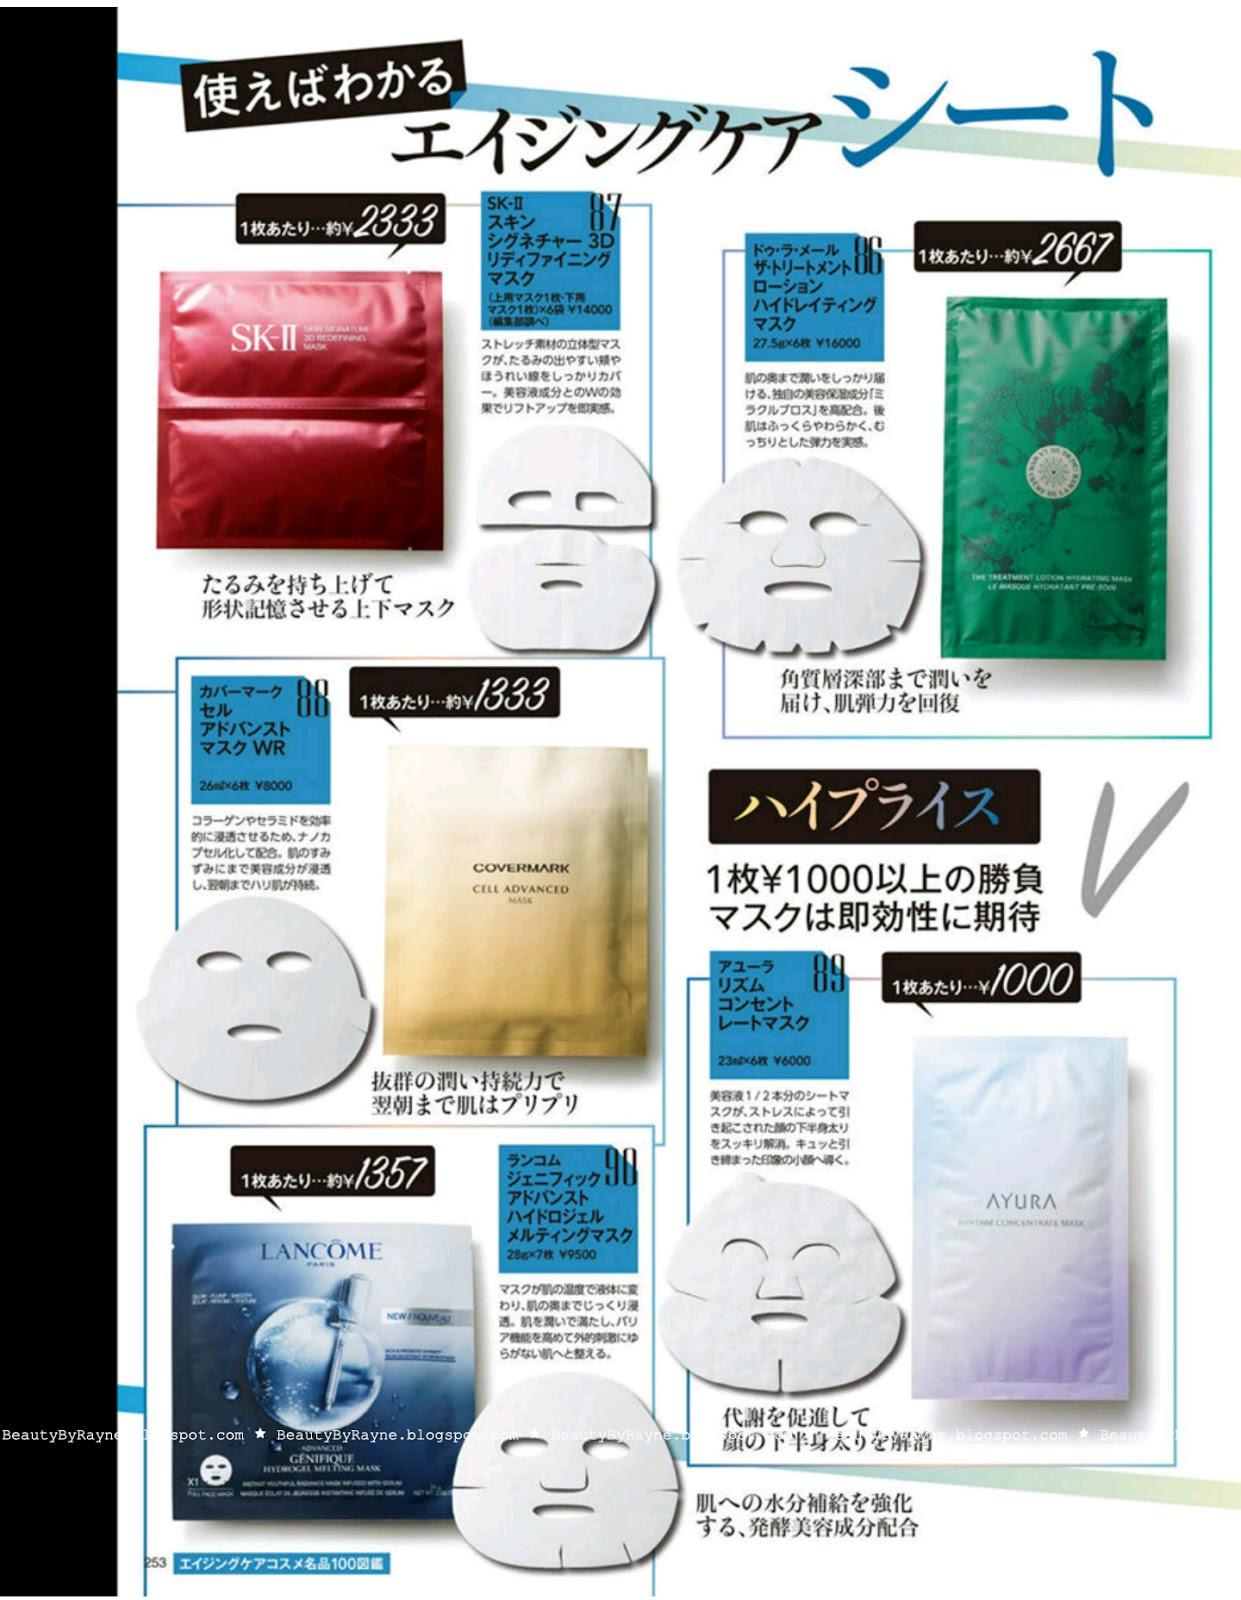 Maquia November 2018 Issue, Free Japanese Beauty Magazine Scans